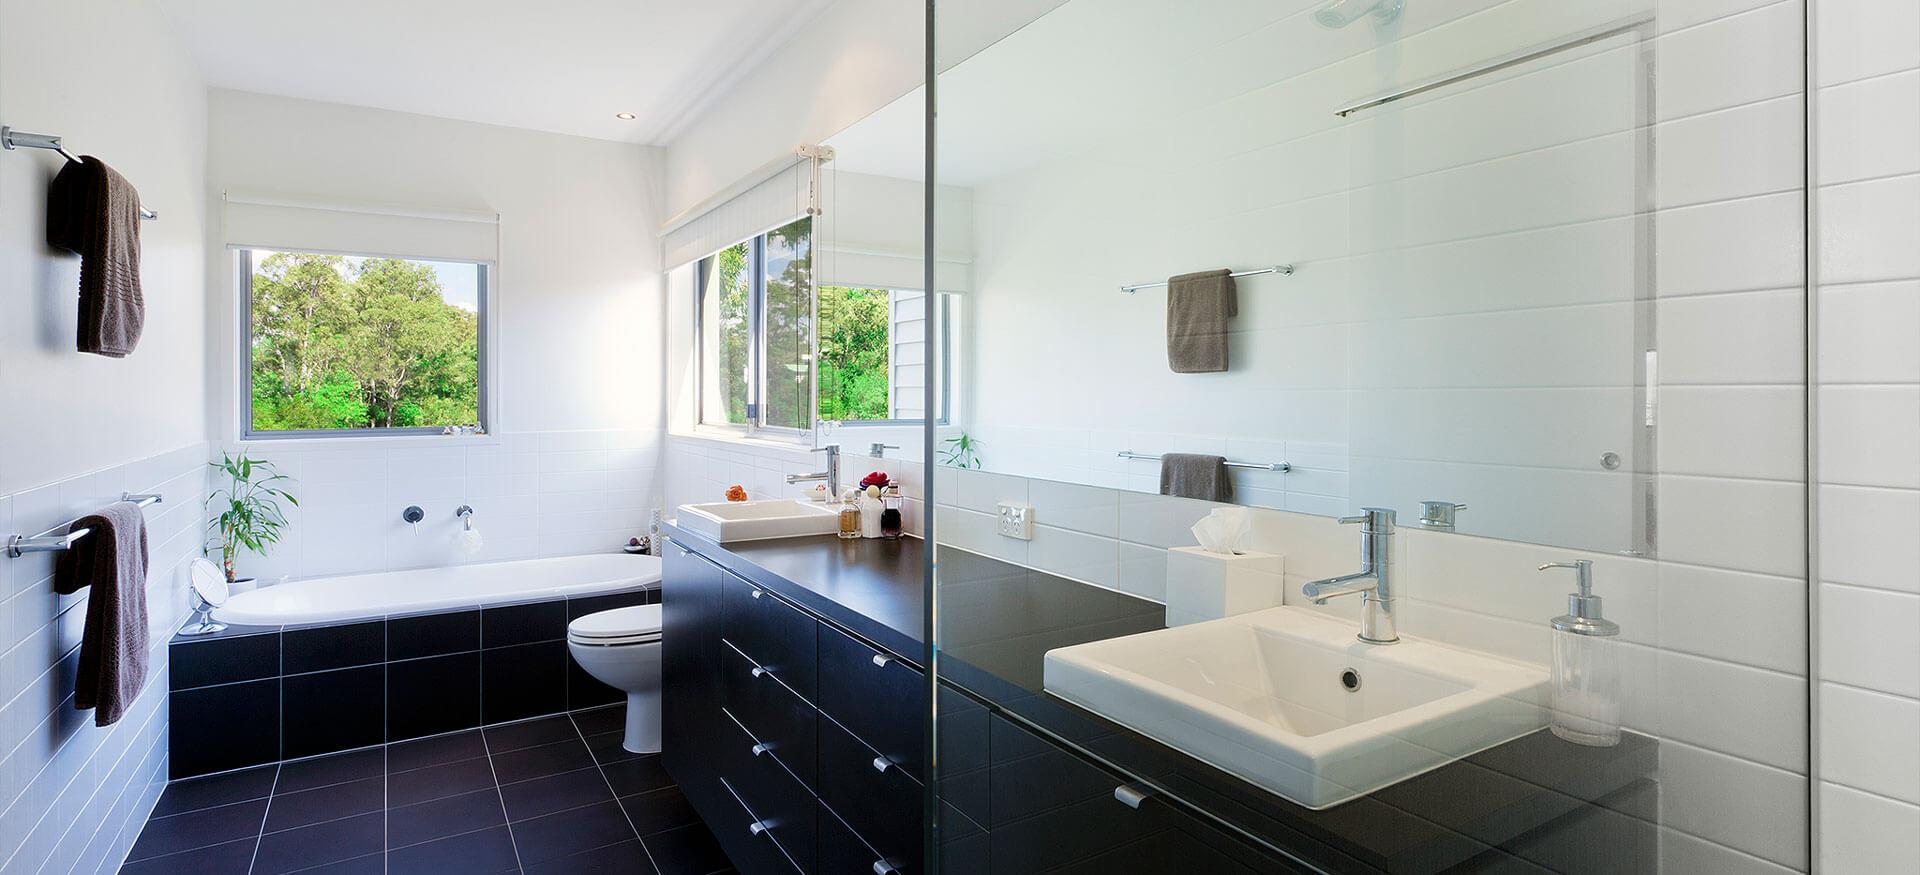 Haustechnik Commes Badgestaltung